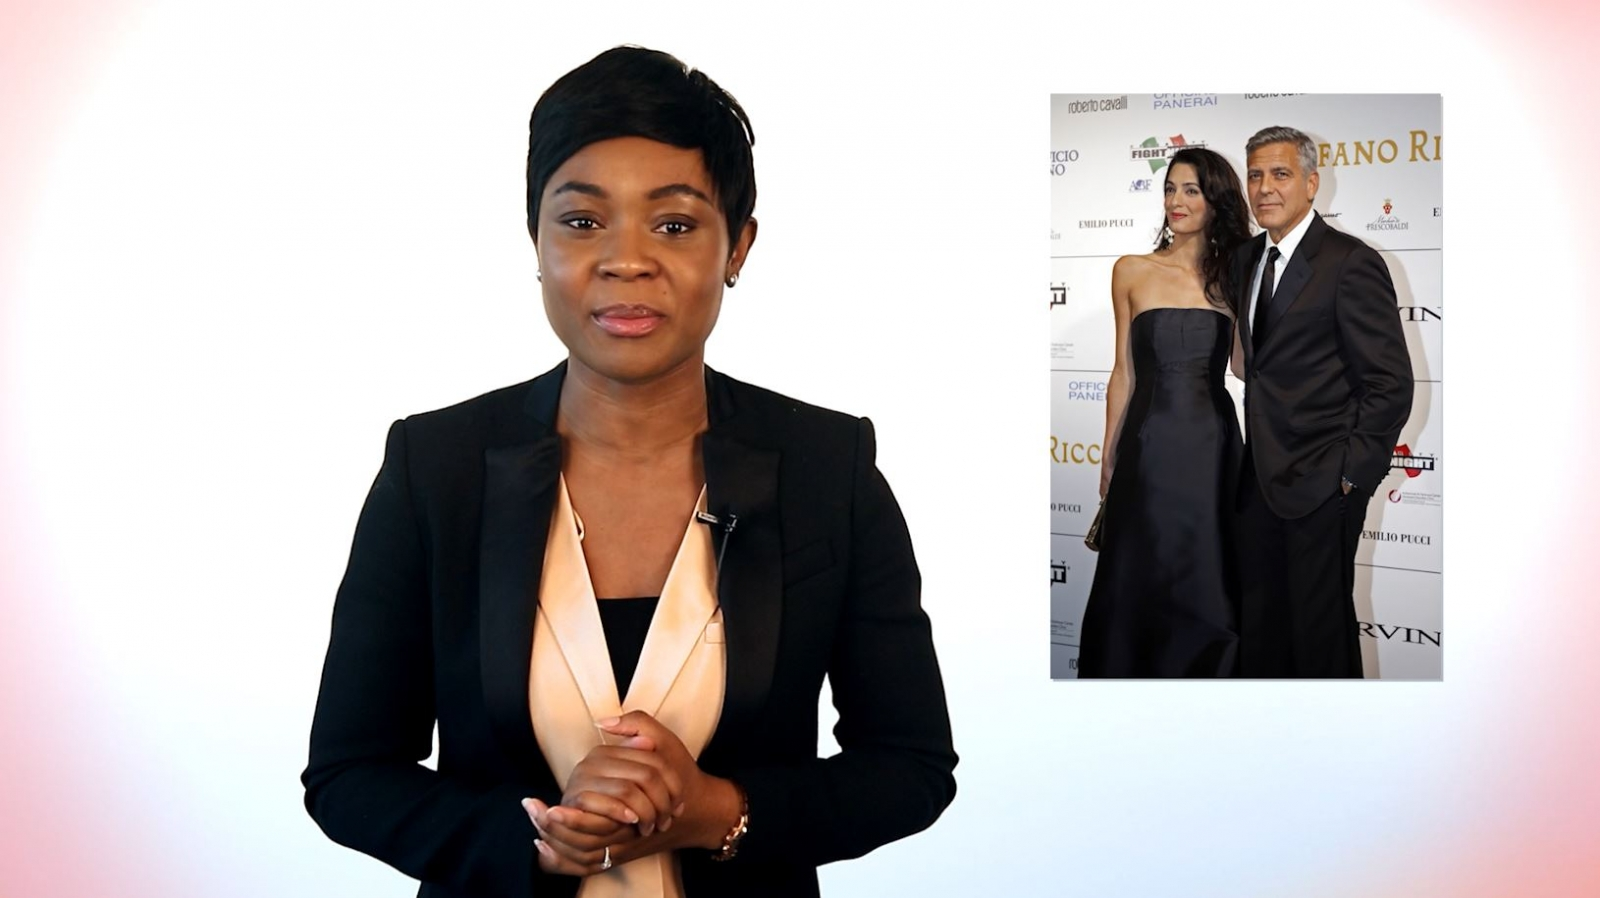 A-List Insider: George Clooney's wedding, North West at Paris Fashion Week